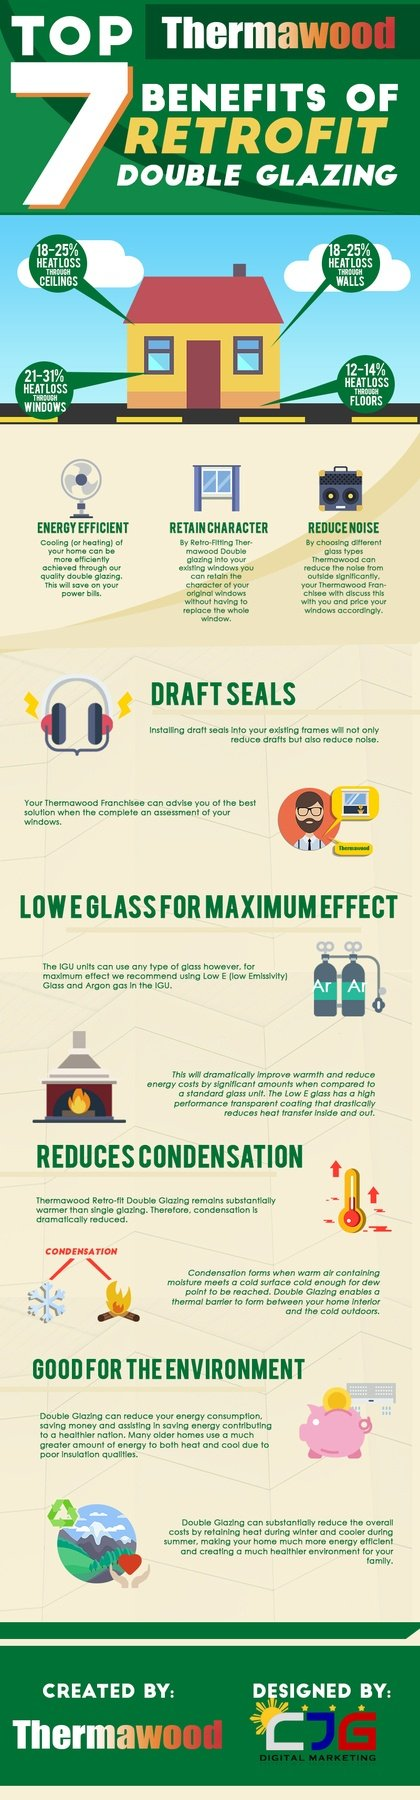 The Top 7 Benefits of Retrofit Double Glazing